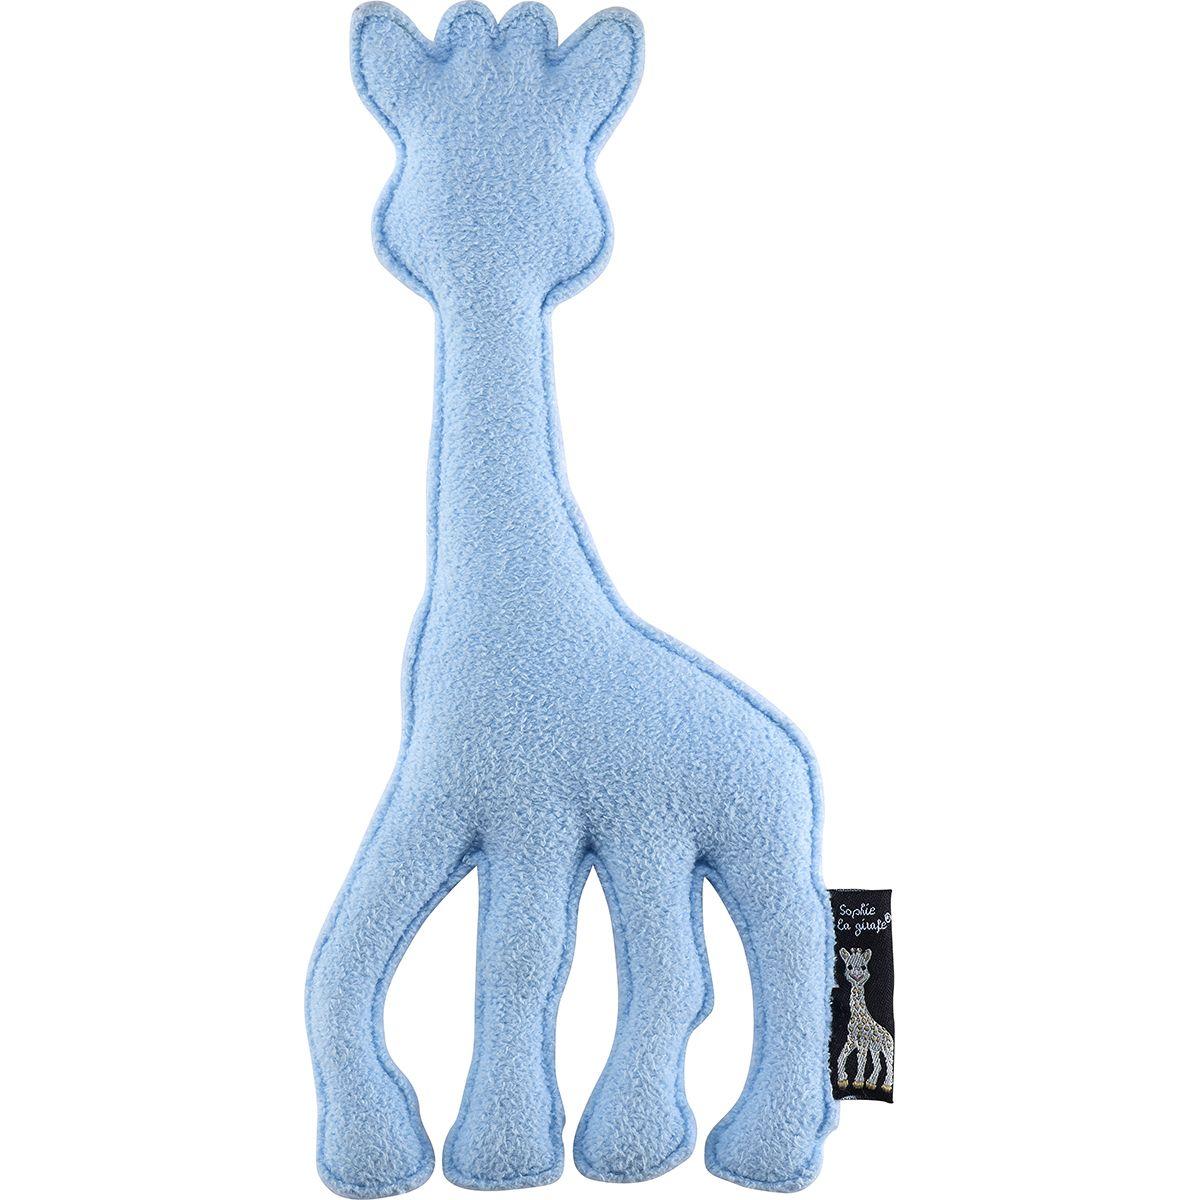 Bleuversion Sophie Lovely Doudou Girafe GarçonVulliIdées La SVzpUM